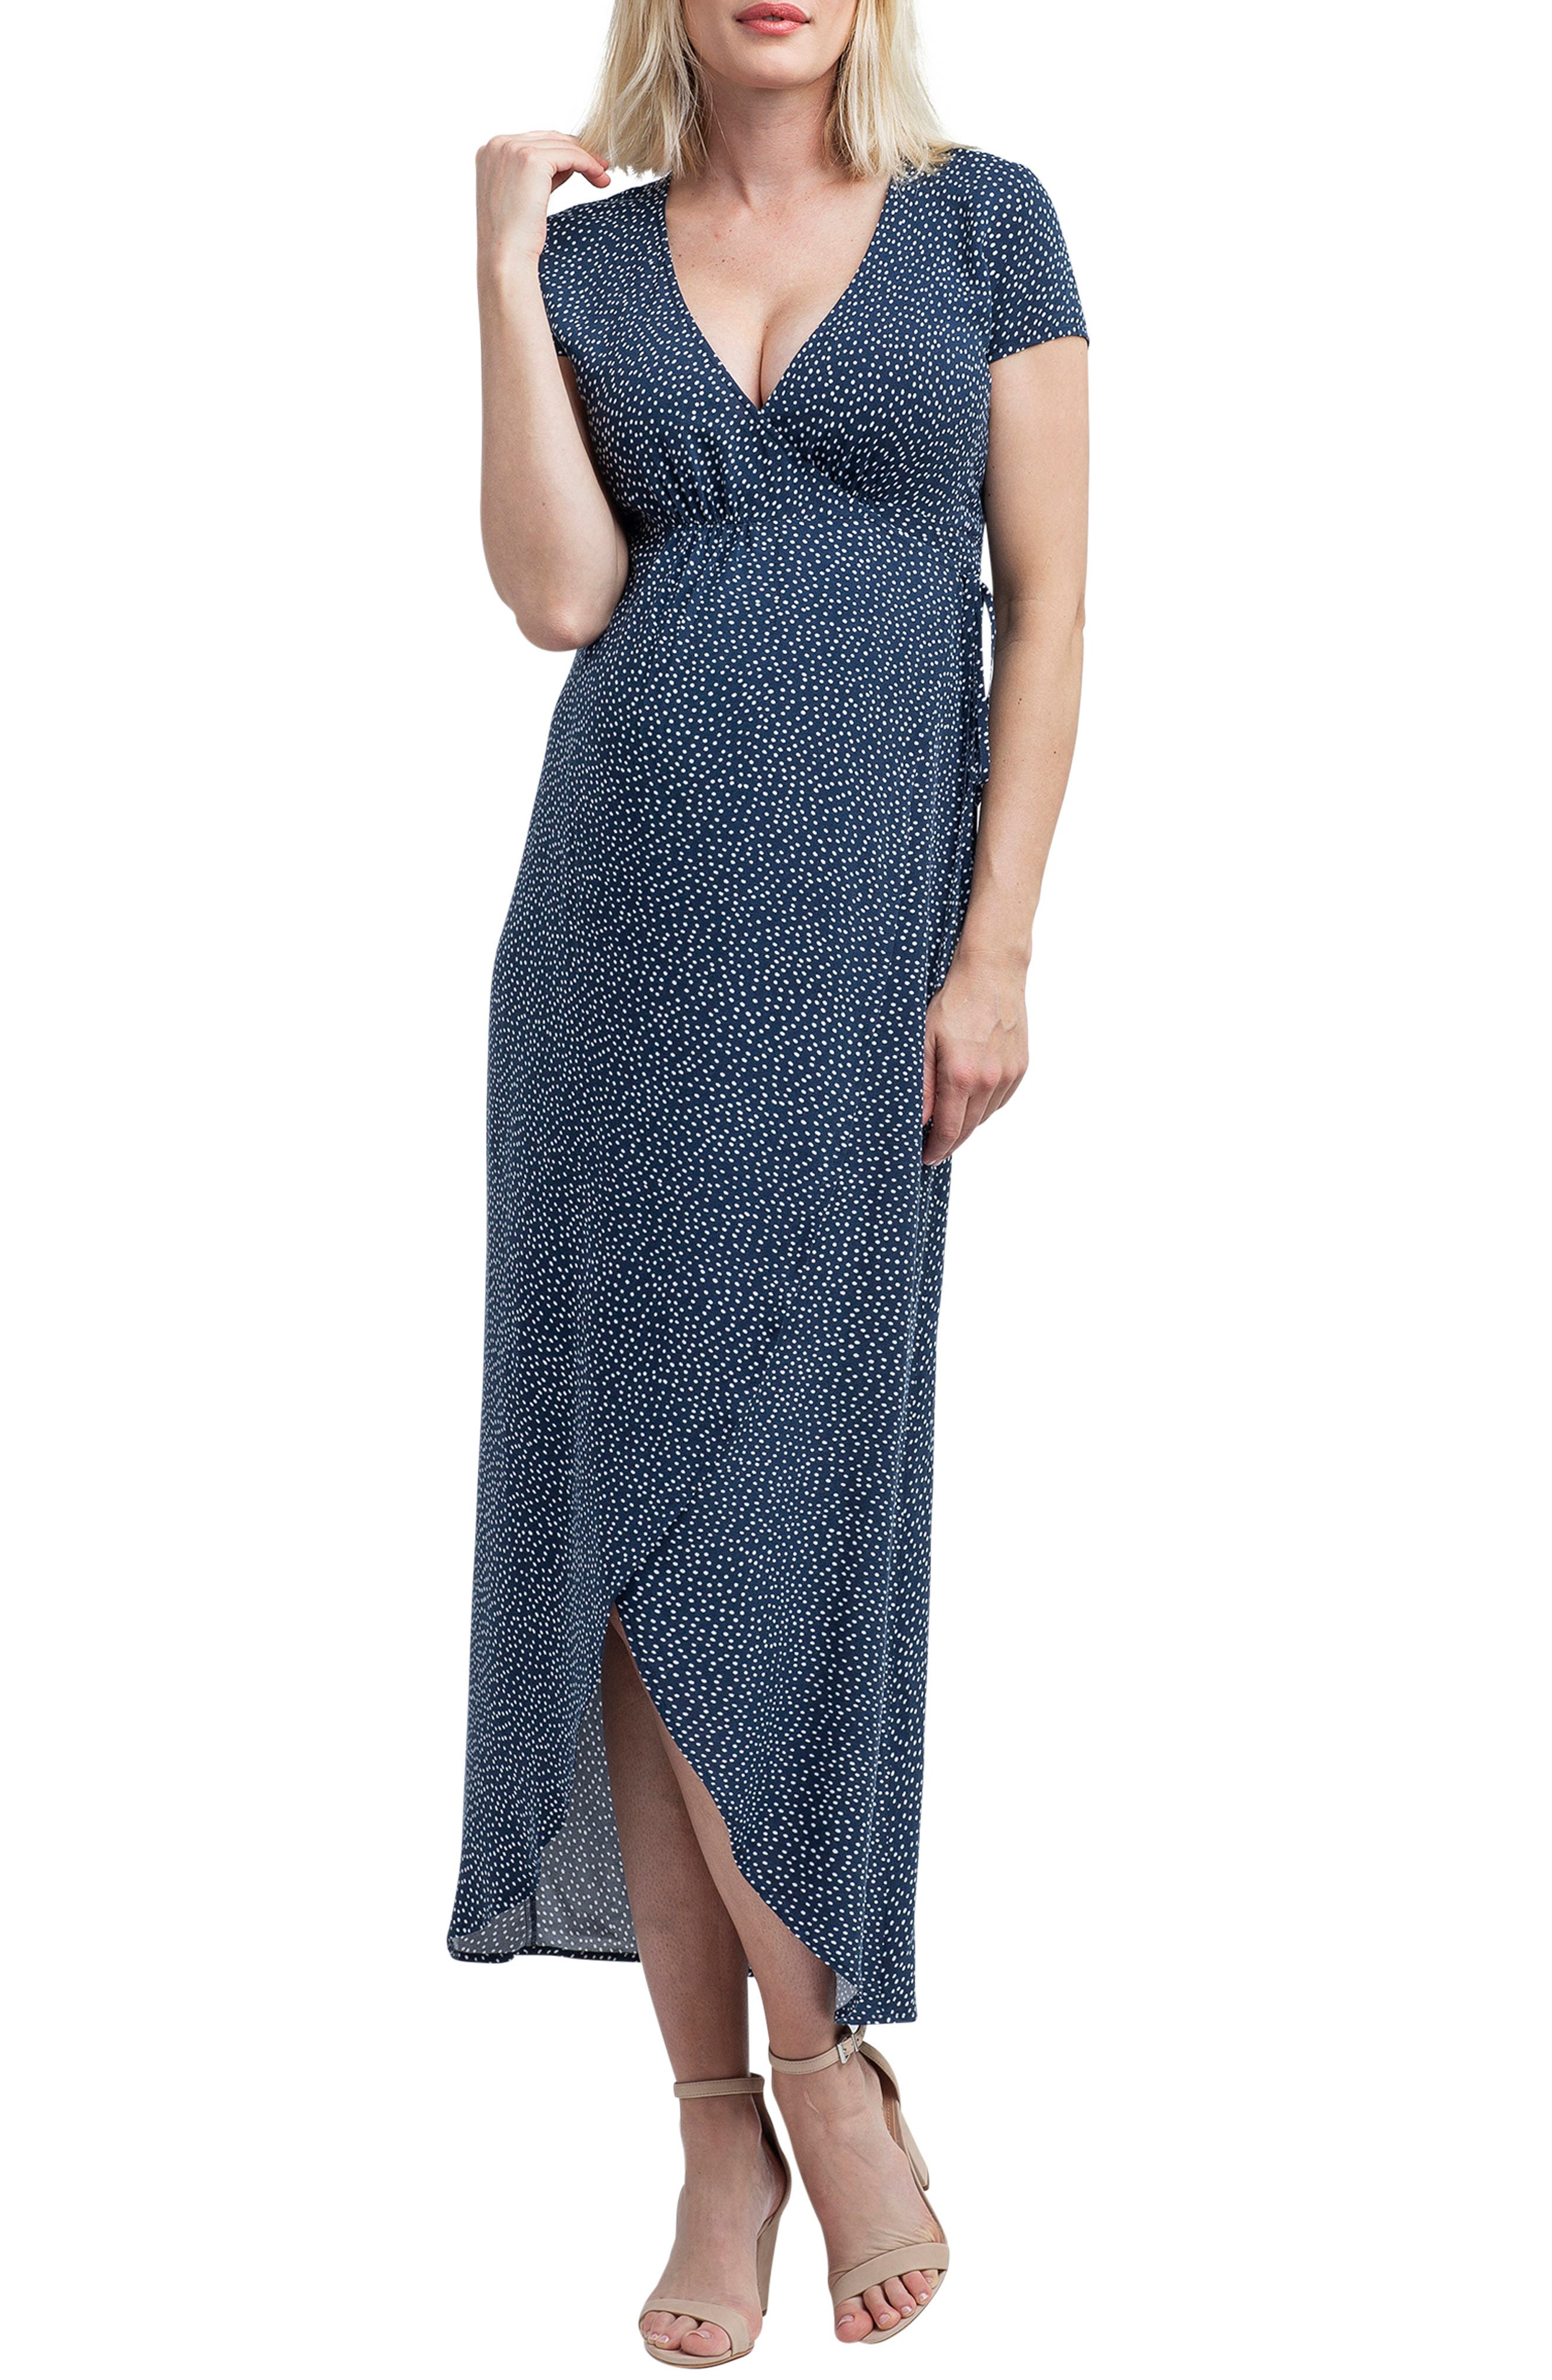 NOM MATERNITY Delilah Maternity/Nursing Wrap Maxi Dress, Main, color, 400